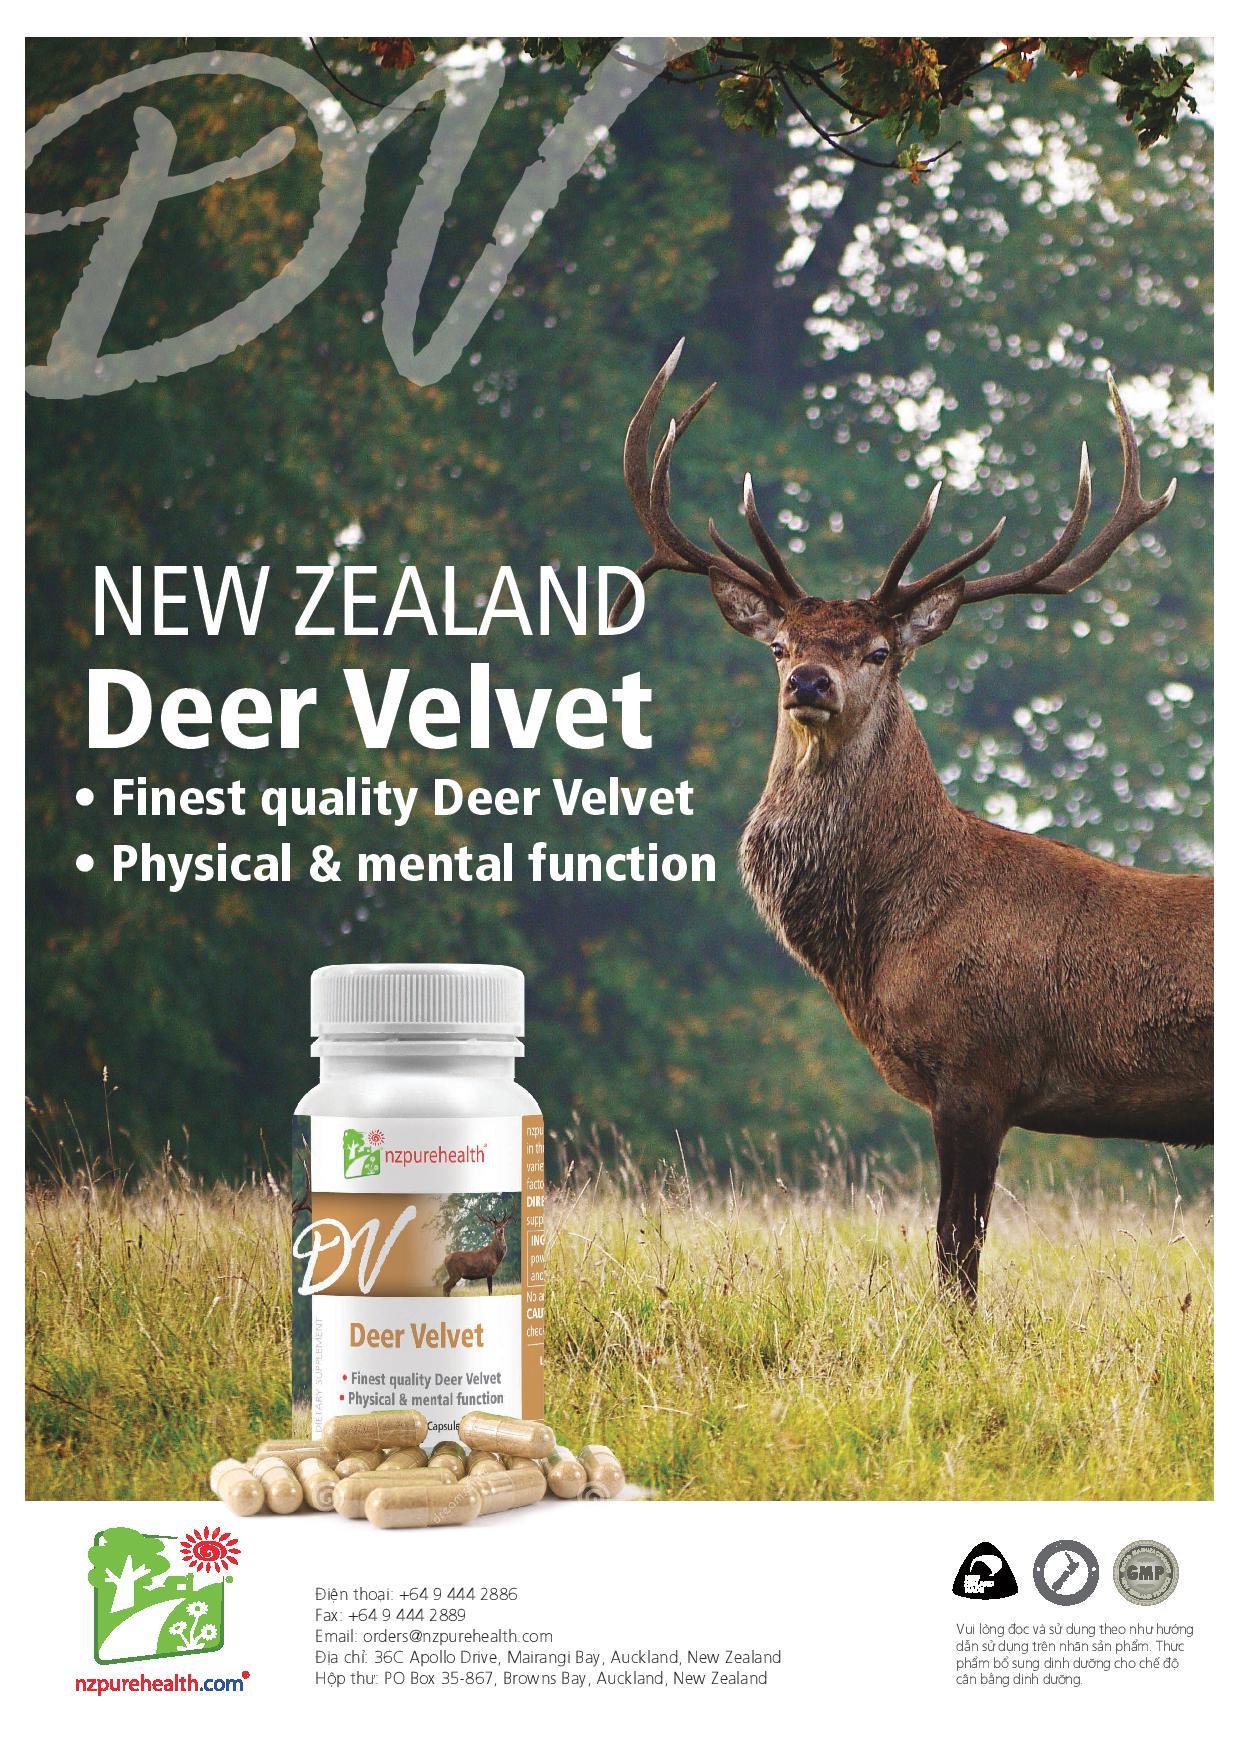 Viên Uống Nhung Hươu Deer Velvet NzPurehealth